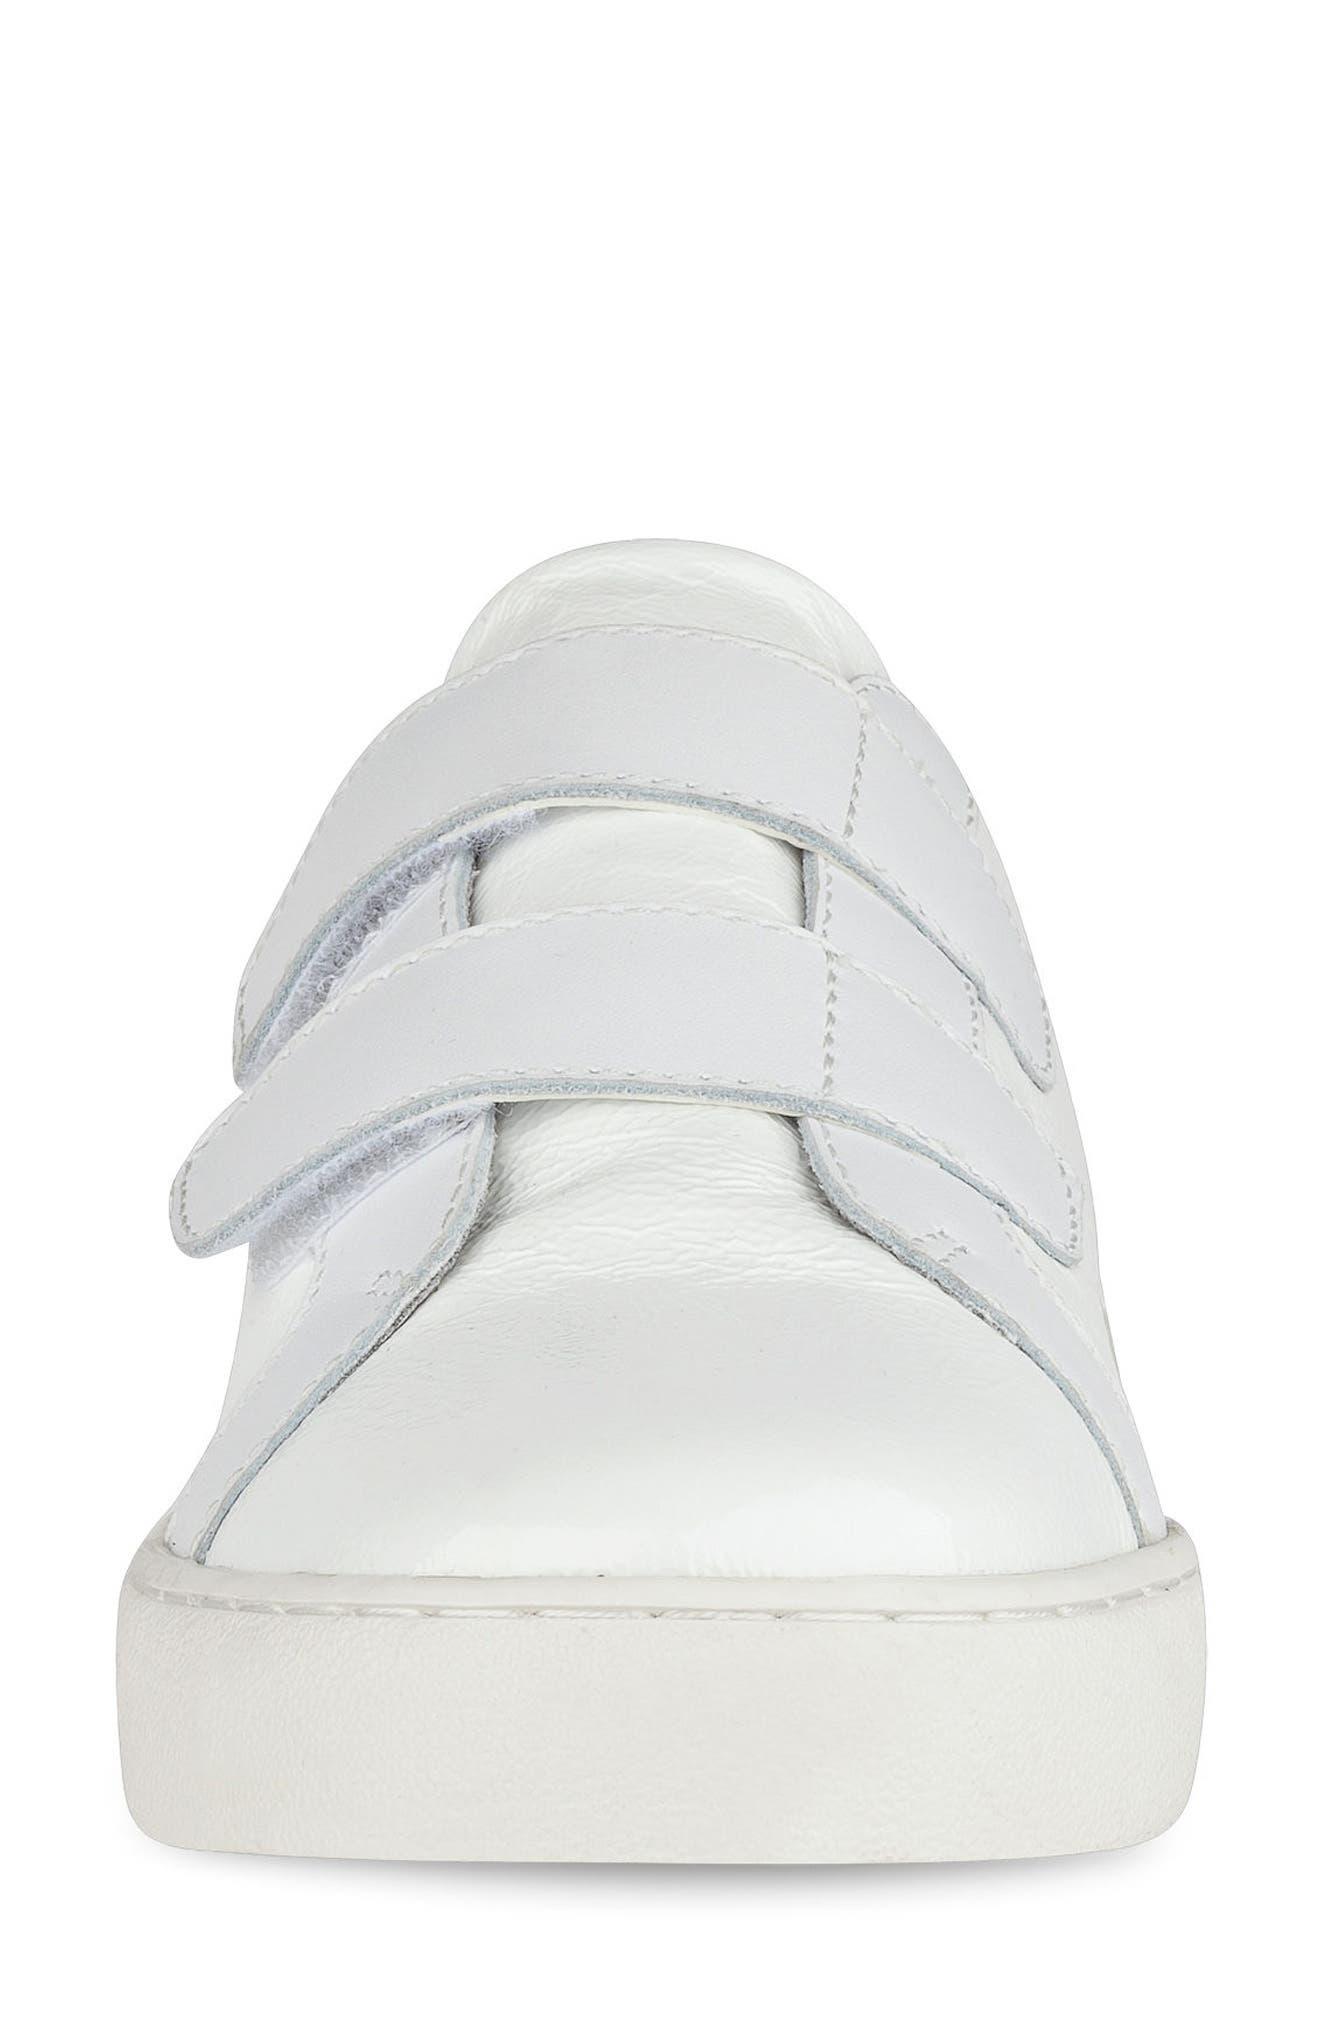 Poeton Sneaker Mule,                             Alternate thumbnail 8, color,